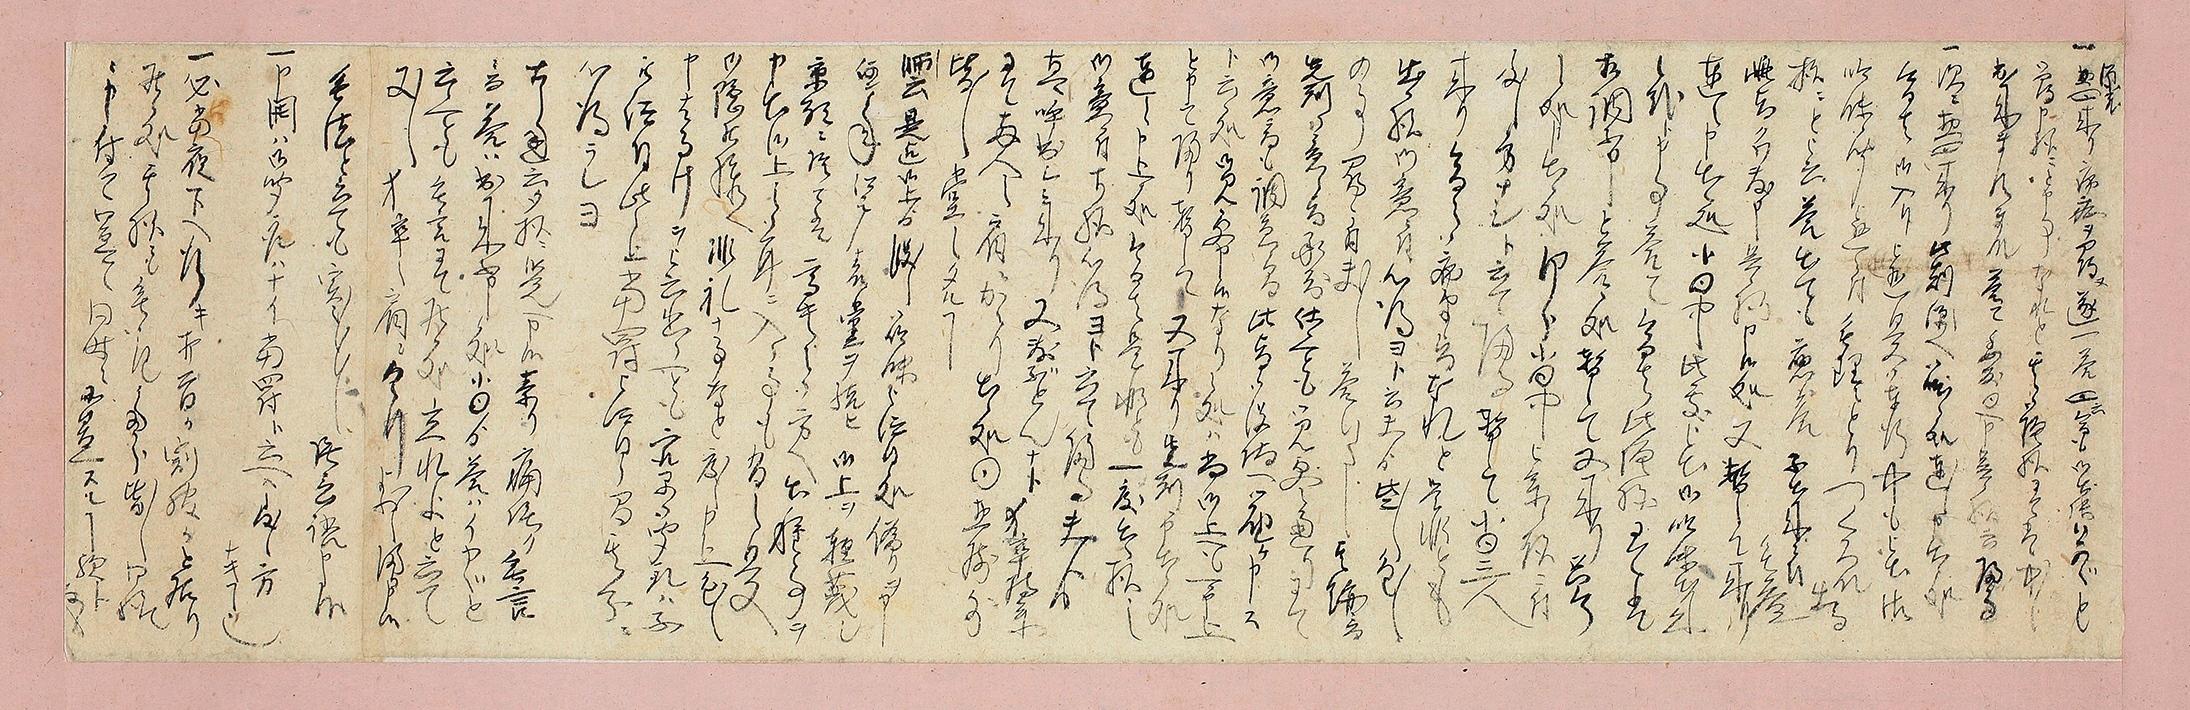 https://www.kochi-johaku.jp/wp-content/uploads/2018/08/66f24e797b061bd1a13ae2e96c4879f7.jpg